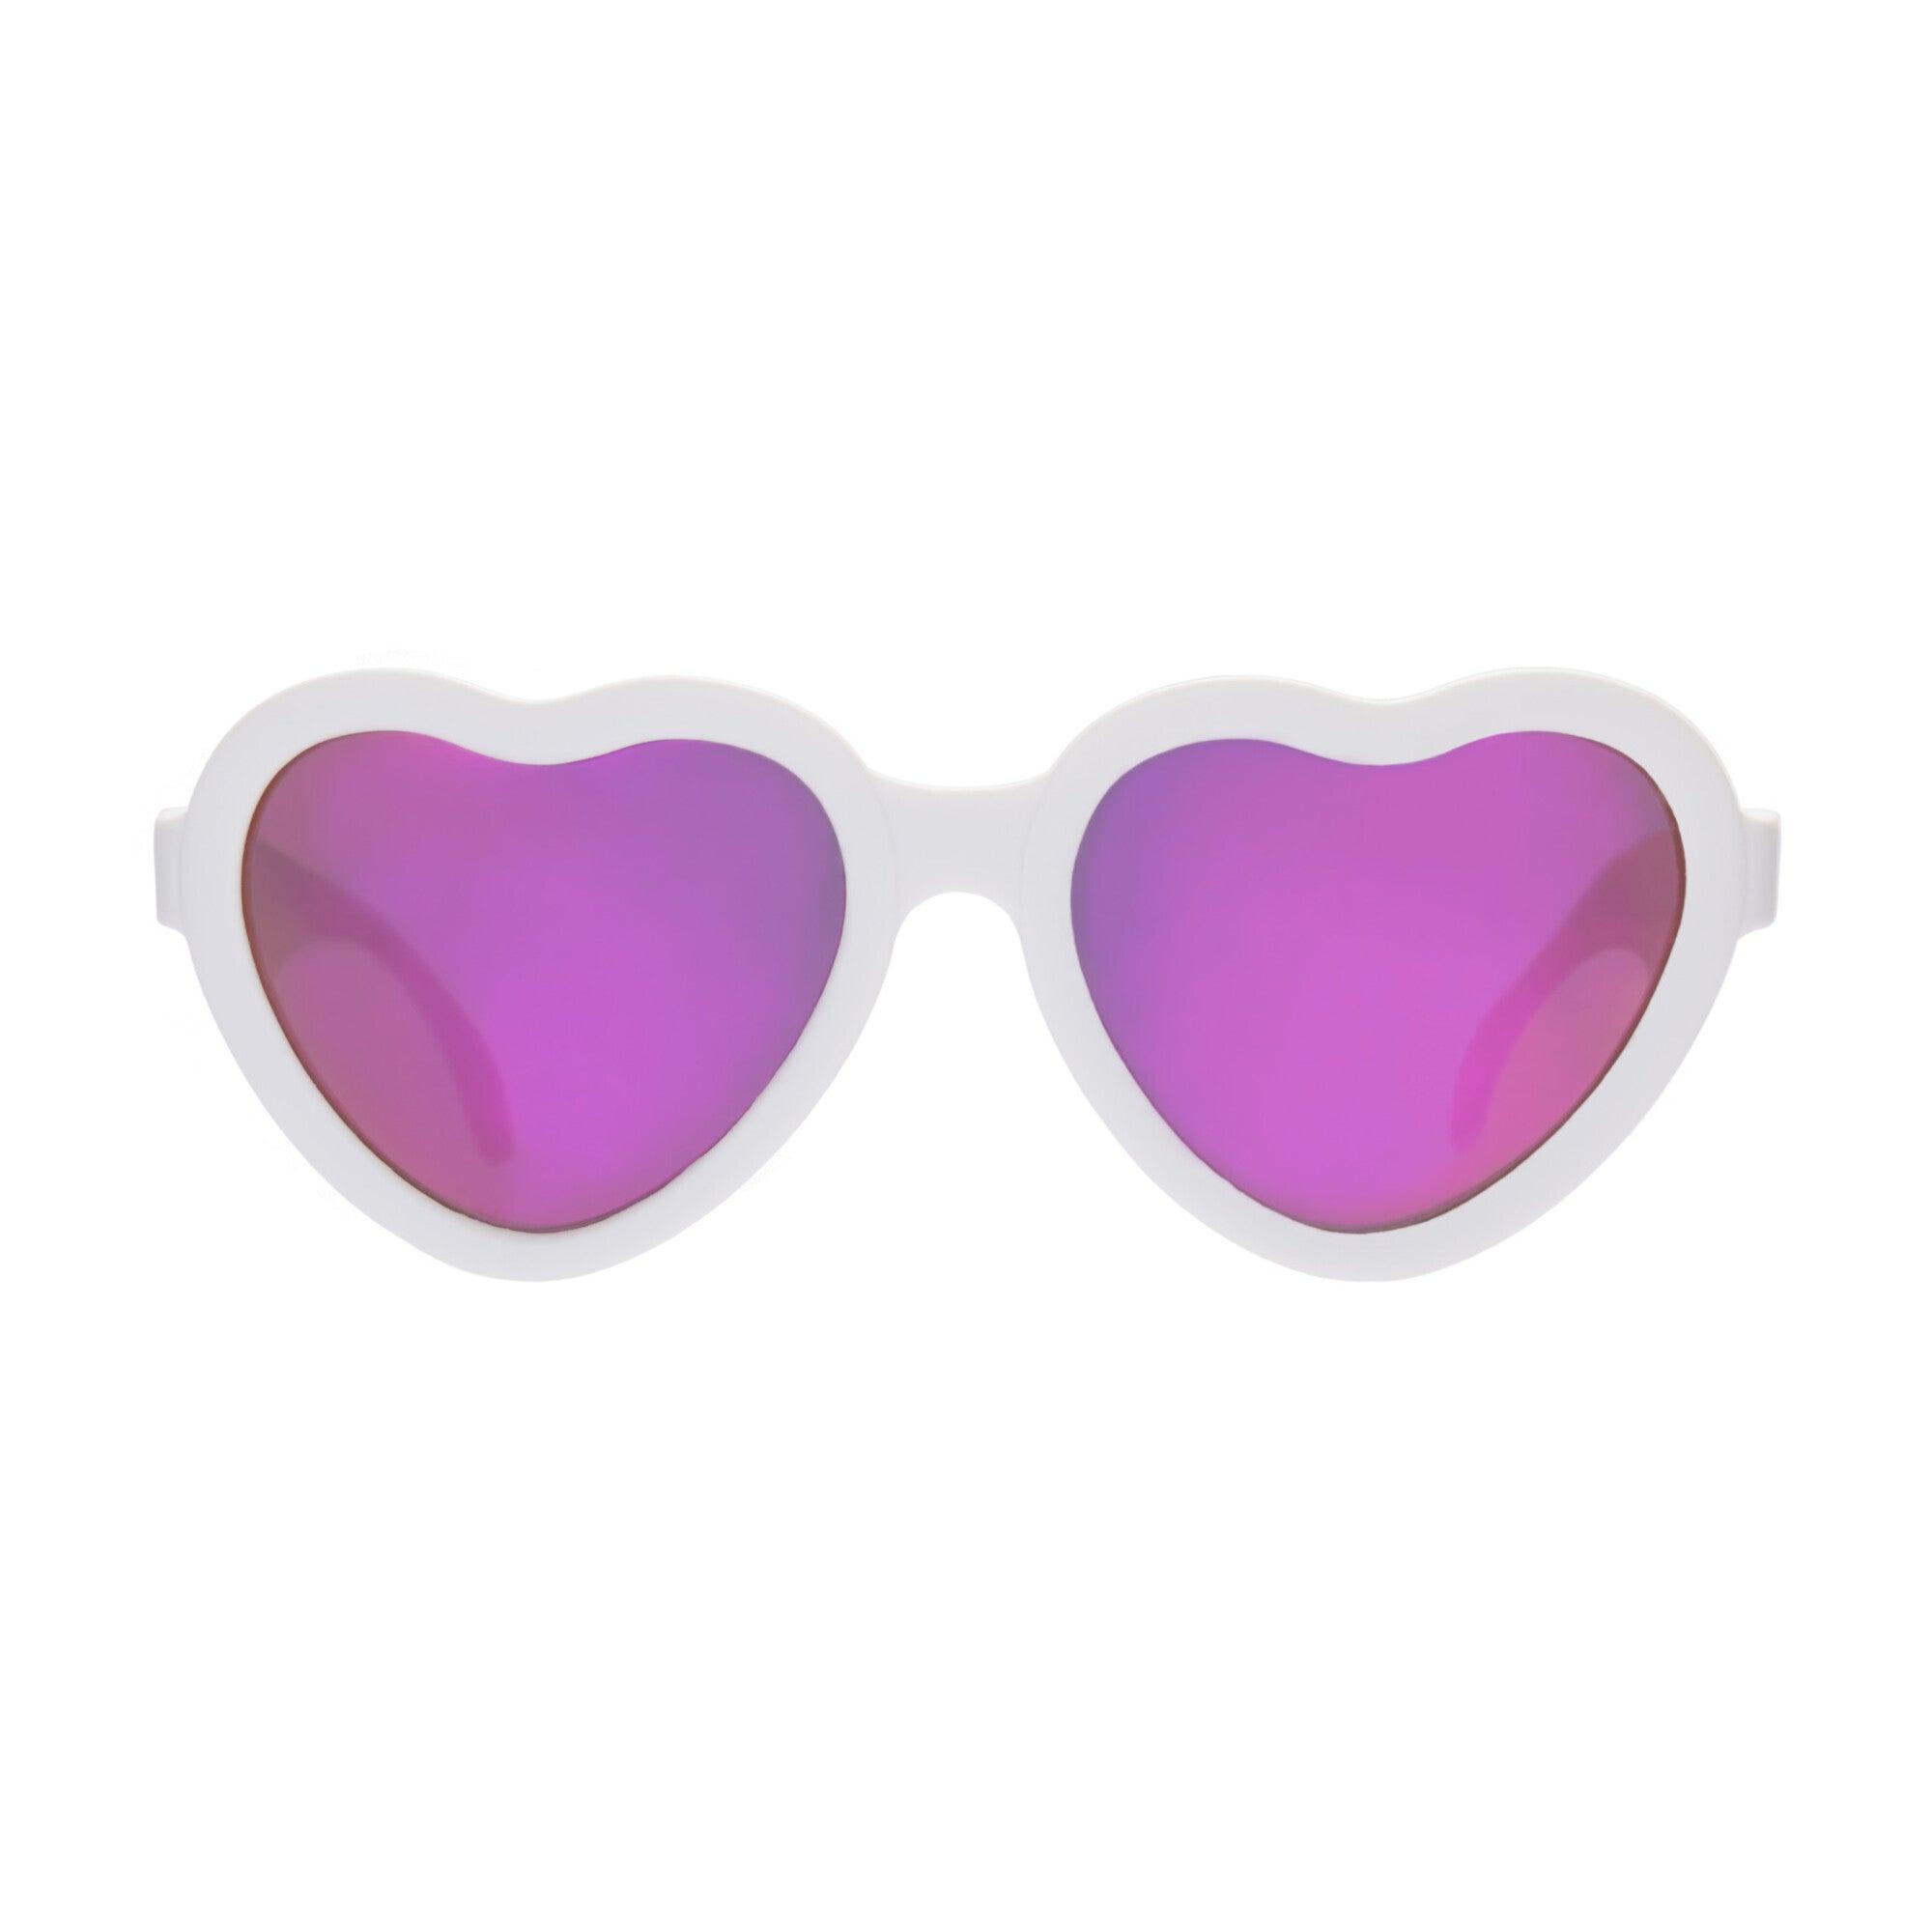 The Sweetheart Sunglasses